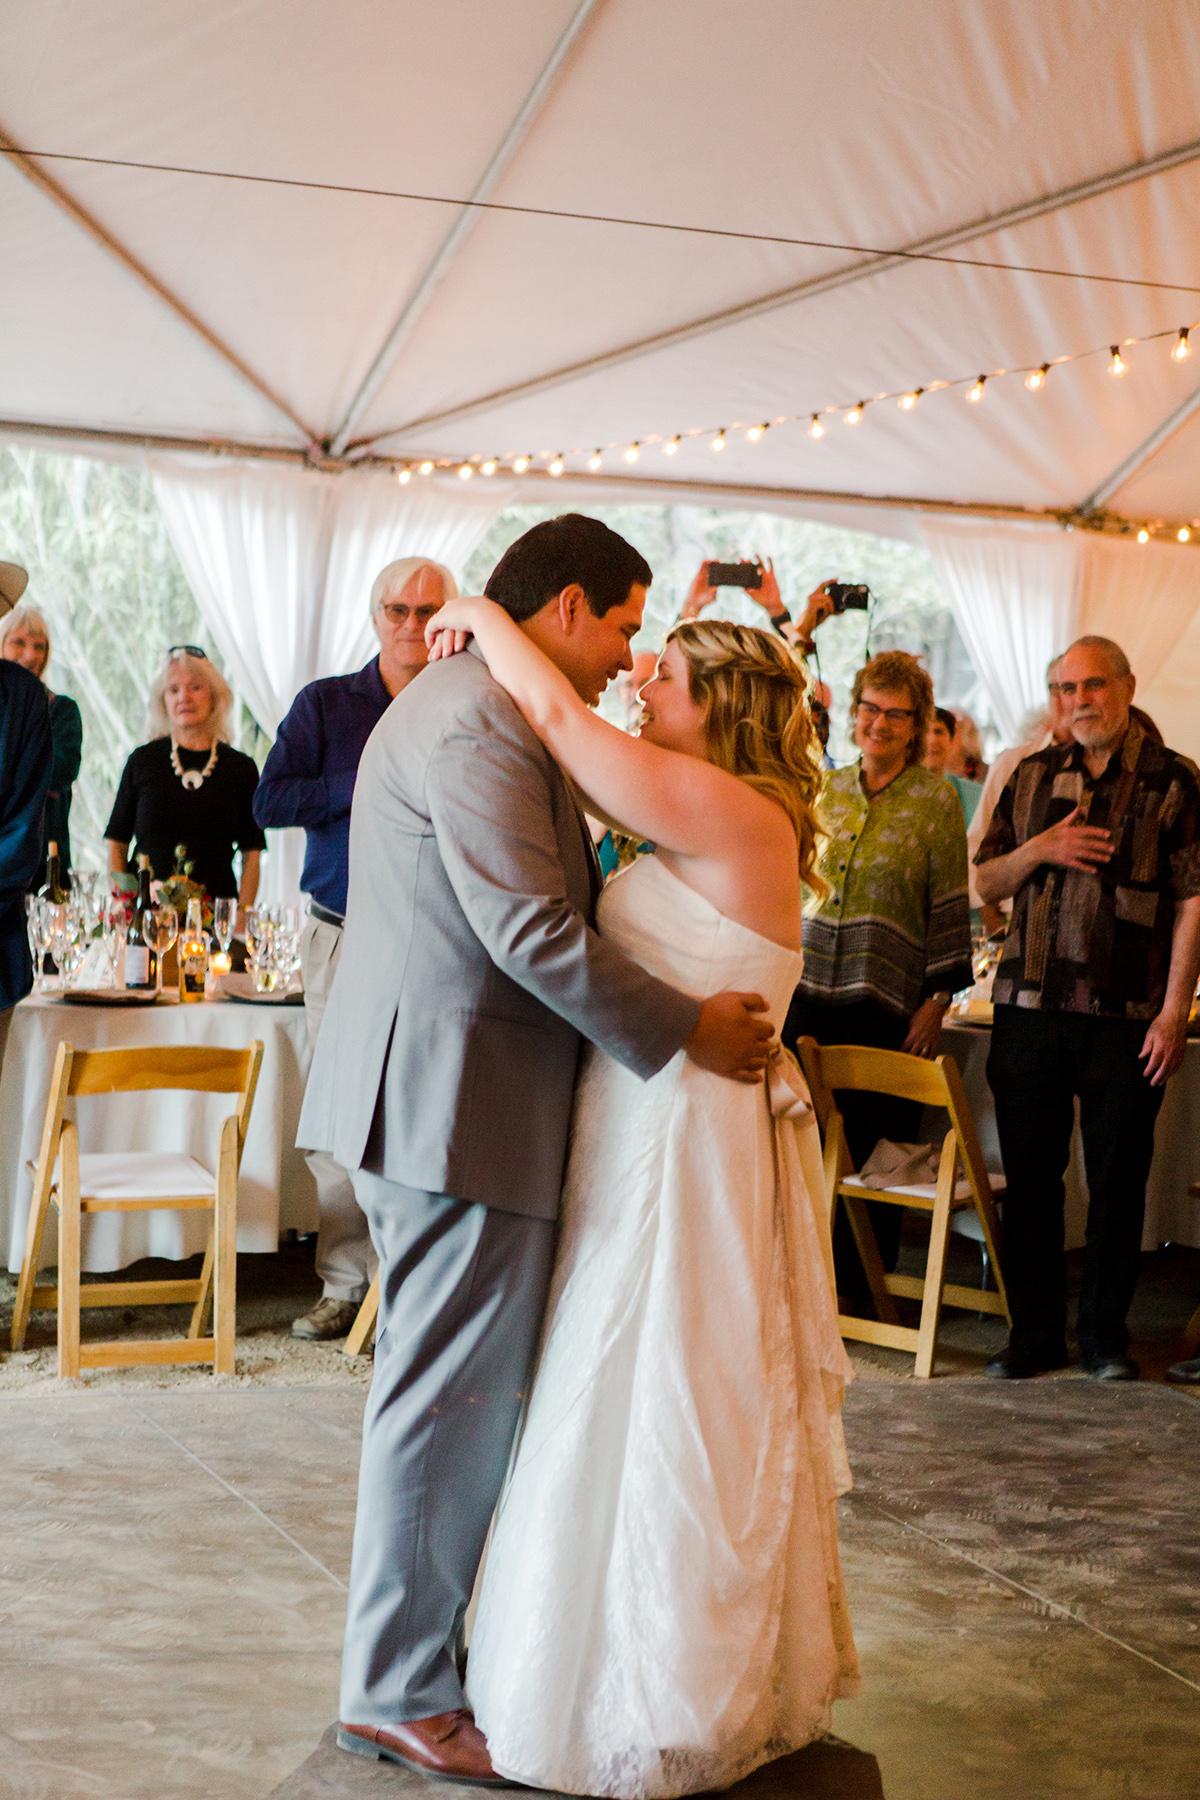 Doug & Katharine's Wedding First Dance Ojai, CA 2017